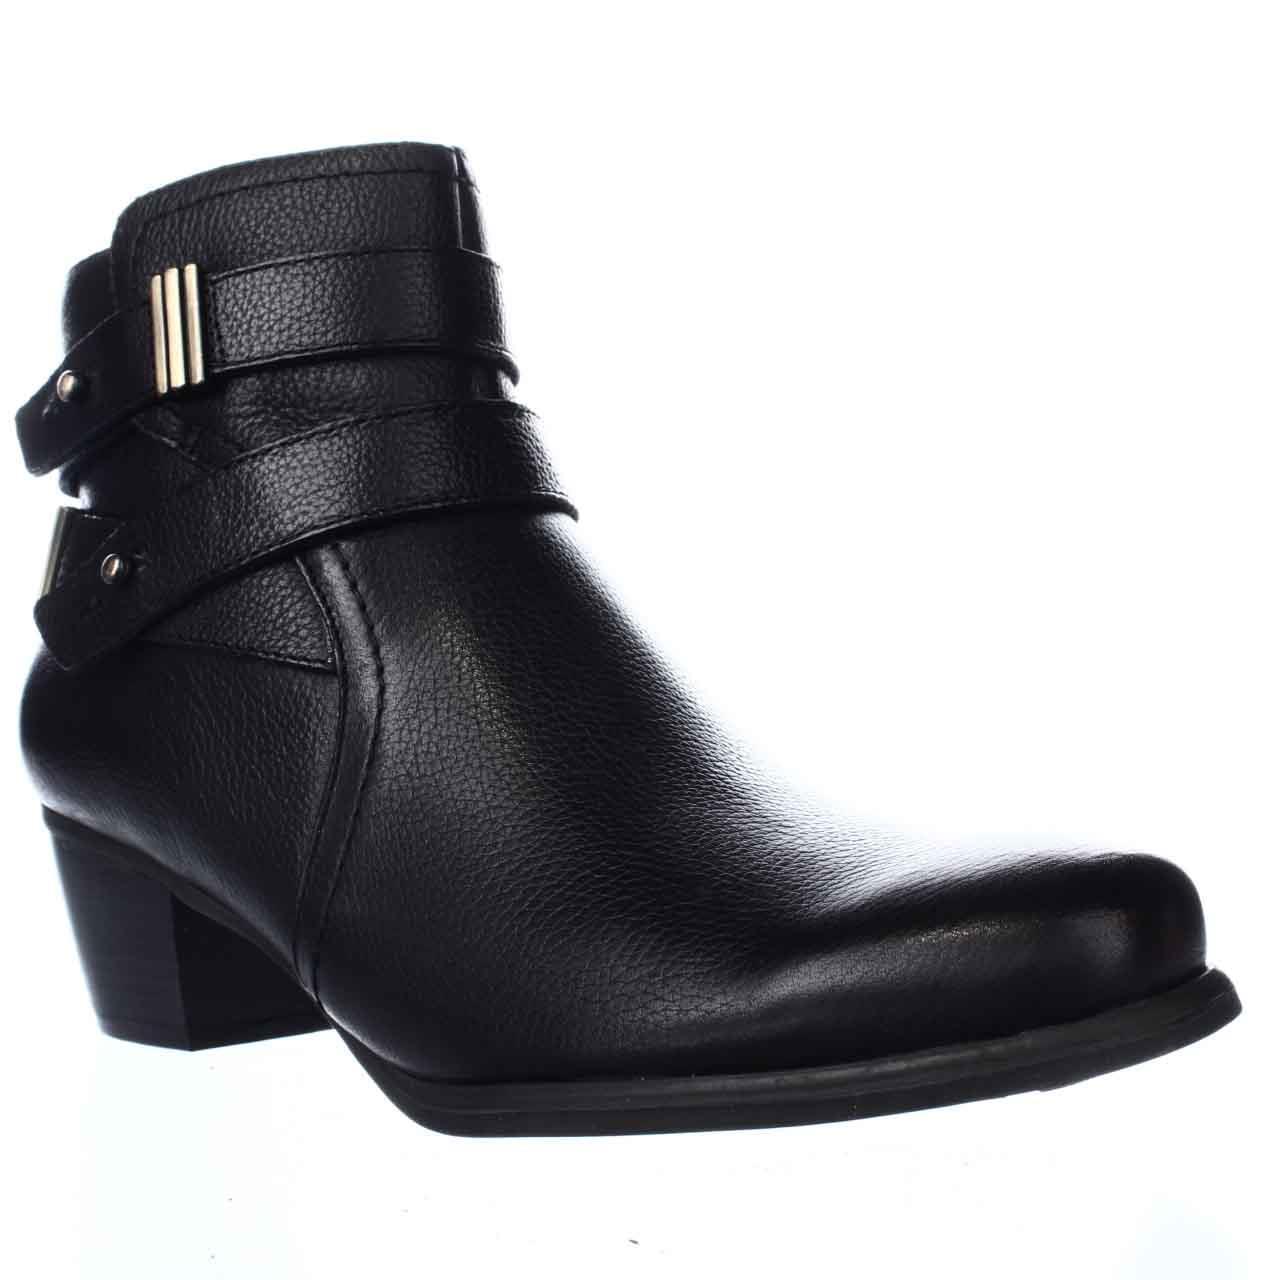 Womens Naturalizer Kepler Block Heel Ankle Boots, Black by Naturalizer